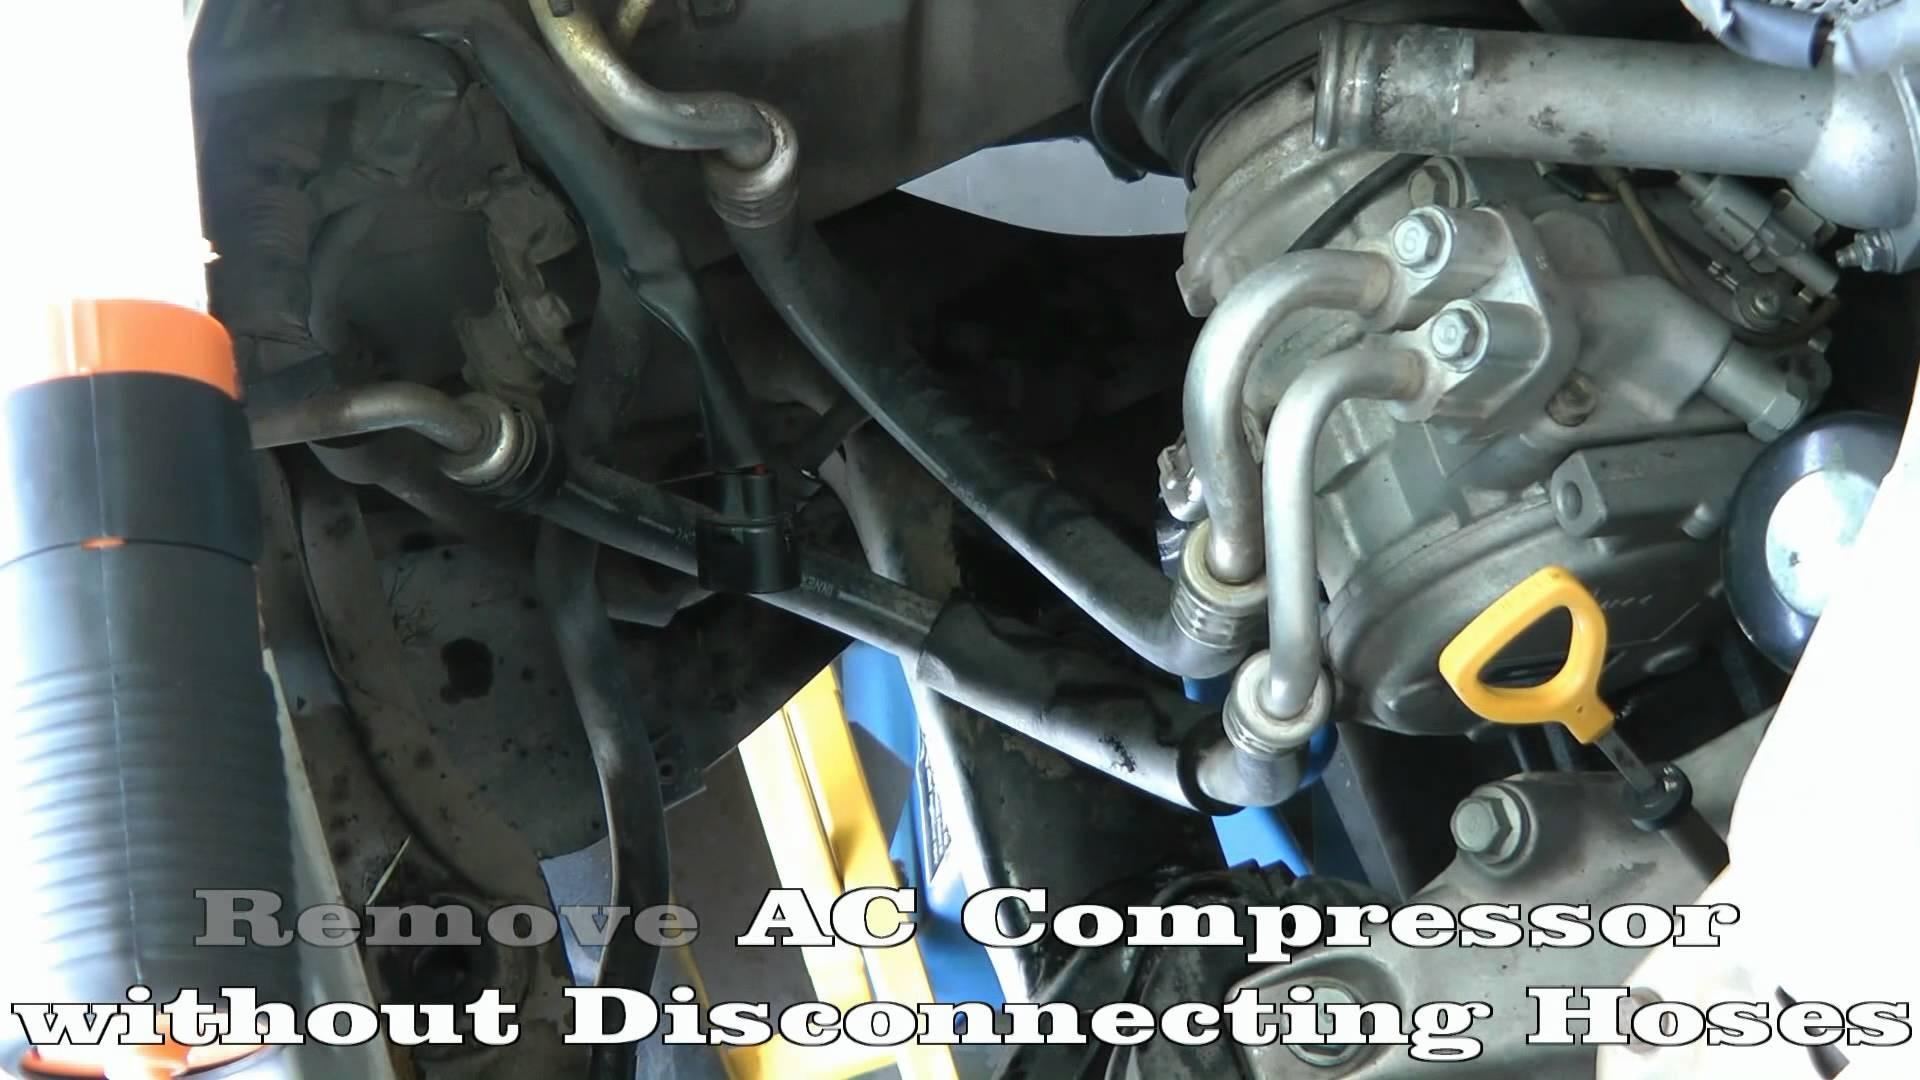 2001 Camry Engine Diagram 1996 Toyota Le Radio Wiring 1994 Part 1 Of 10 Remove Tranny Rebuild